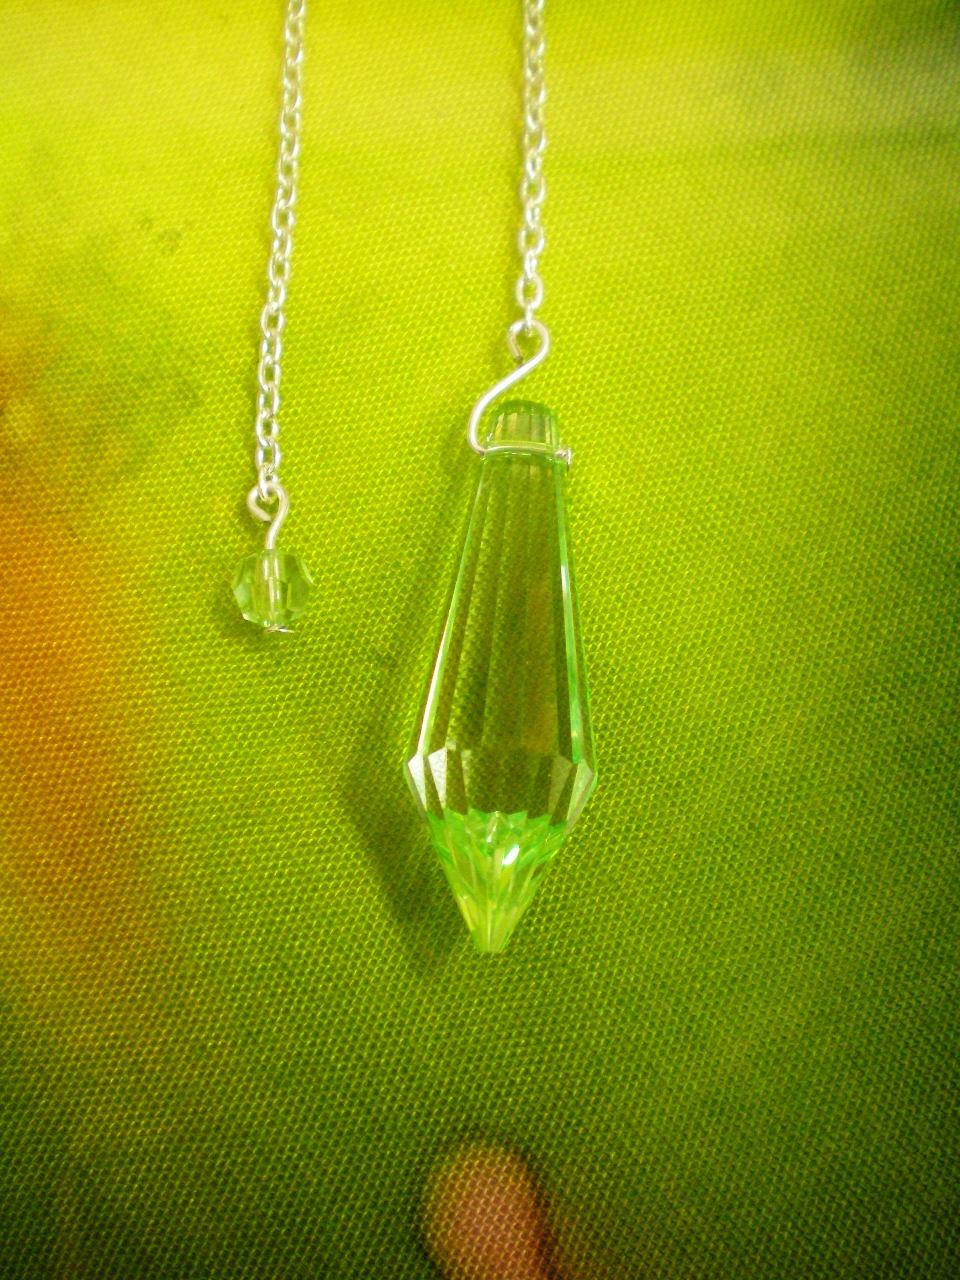 Siderické kyvadlo - 4 Briliant - zelené křšťálové sklo